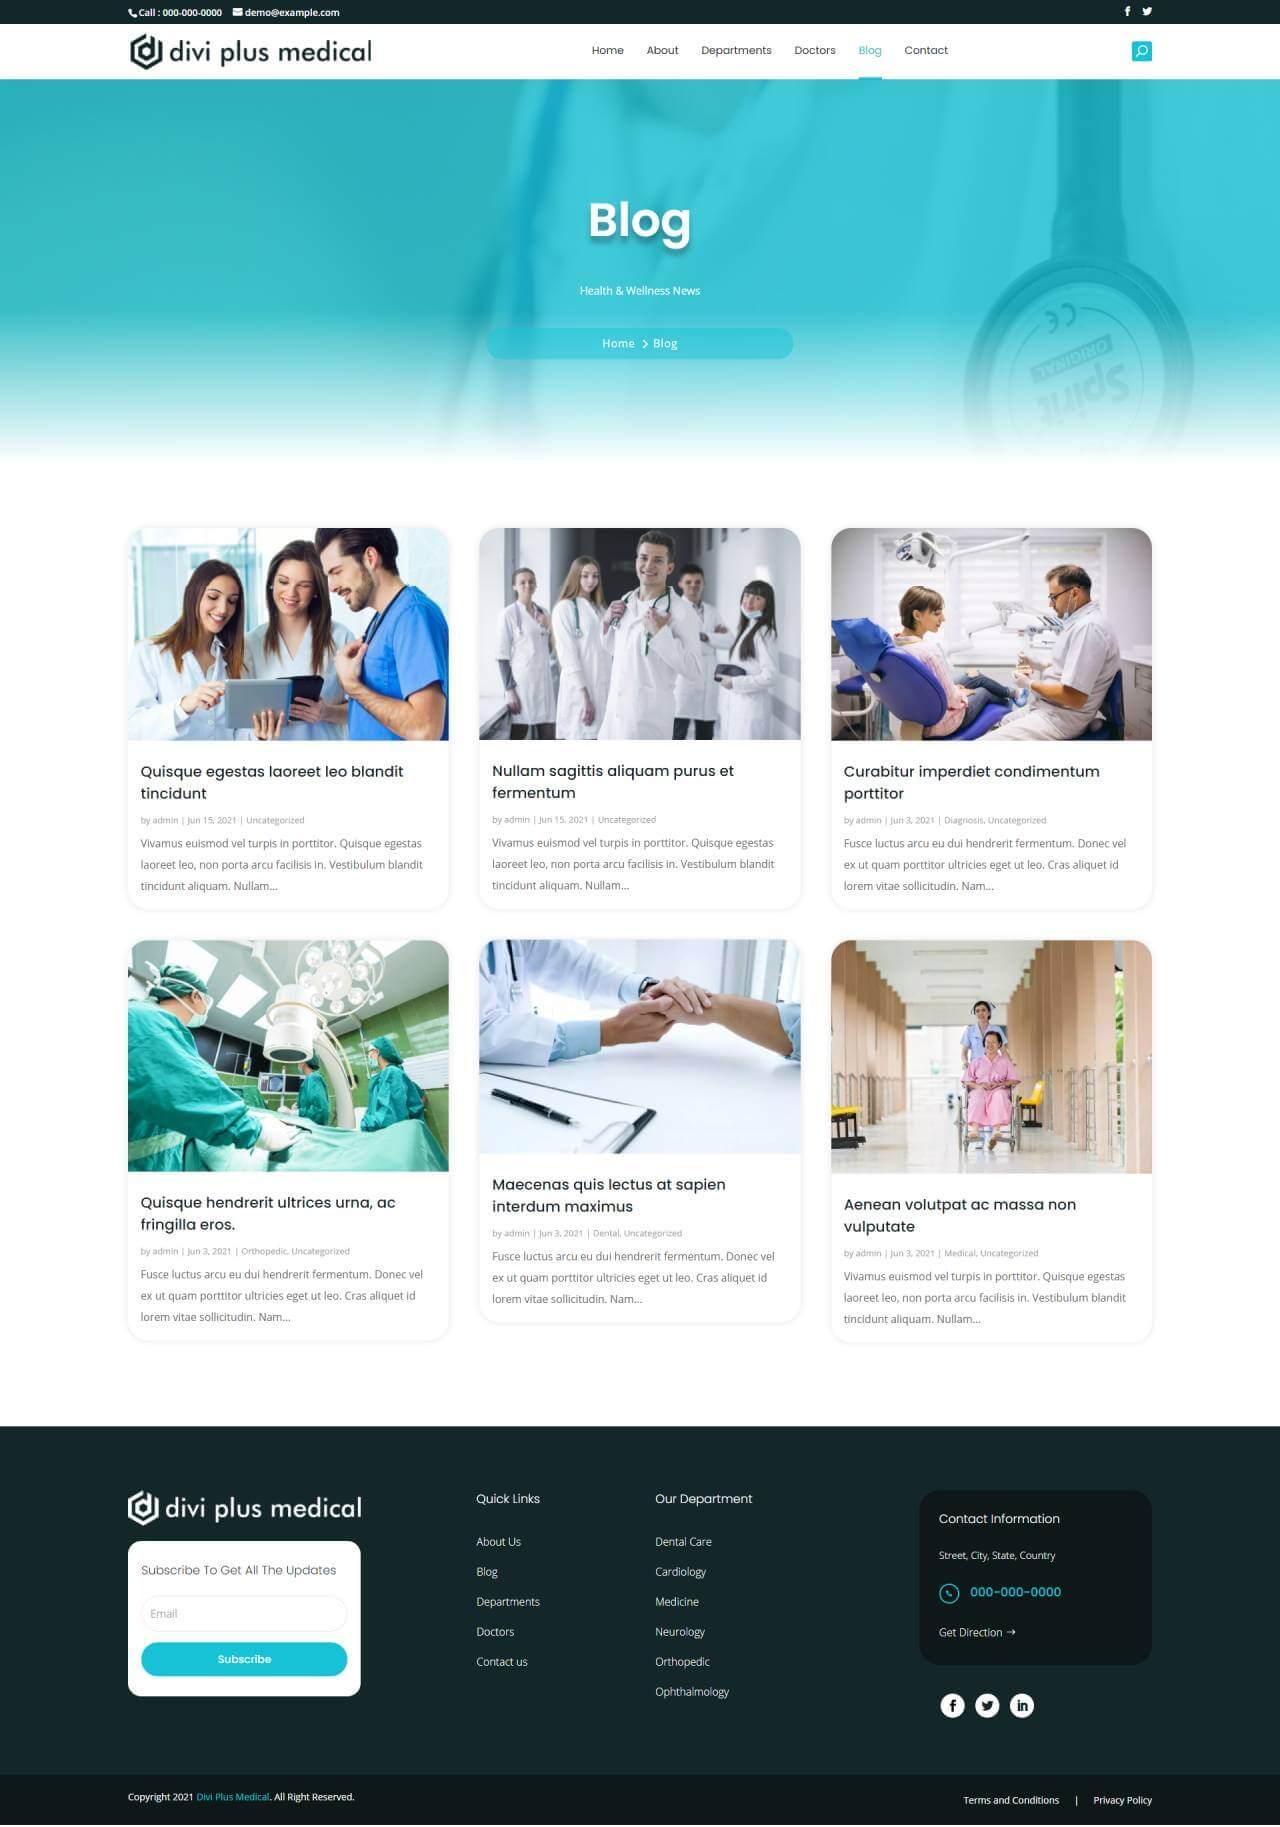 Divi Plus Medical Child Theme Blog